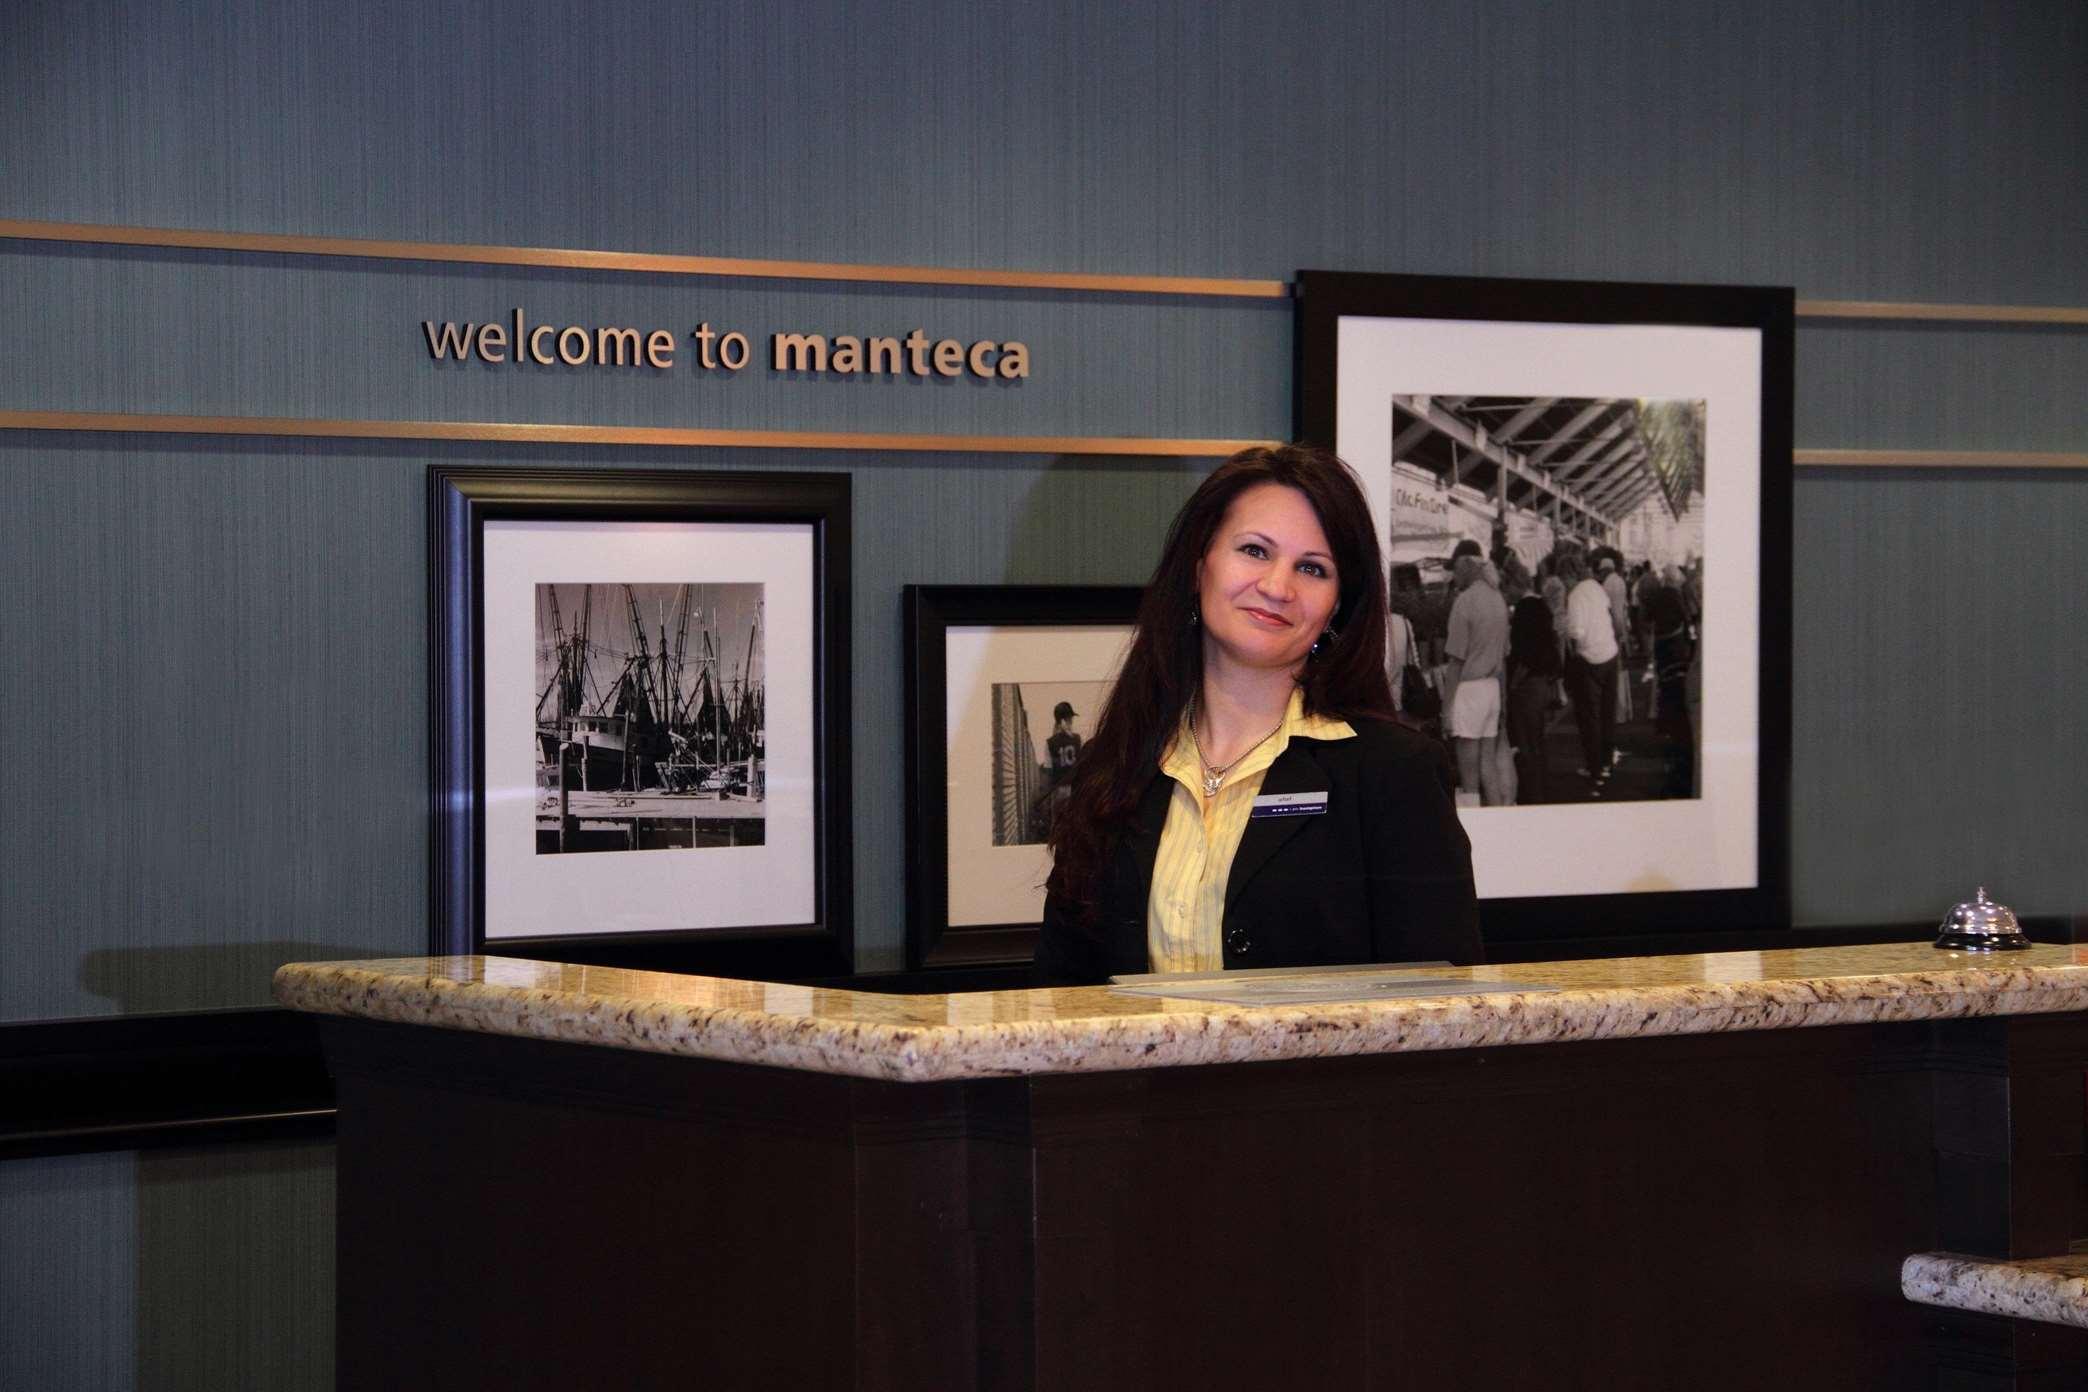 Hampton Inn & Suites Manteca image 6